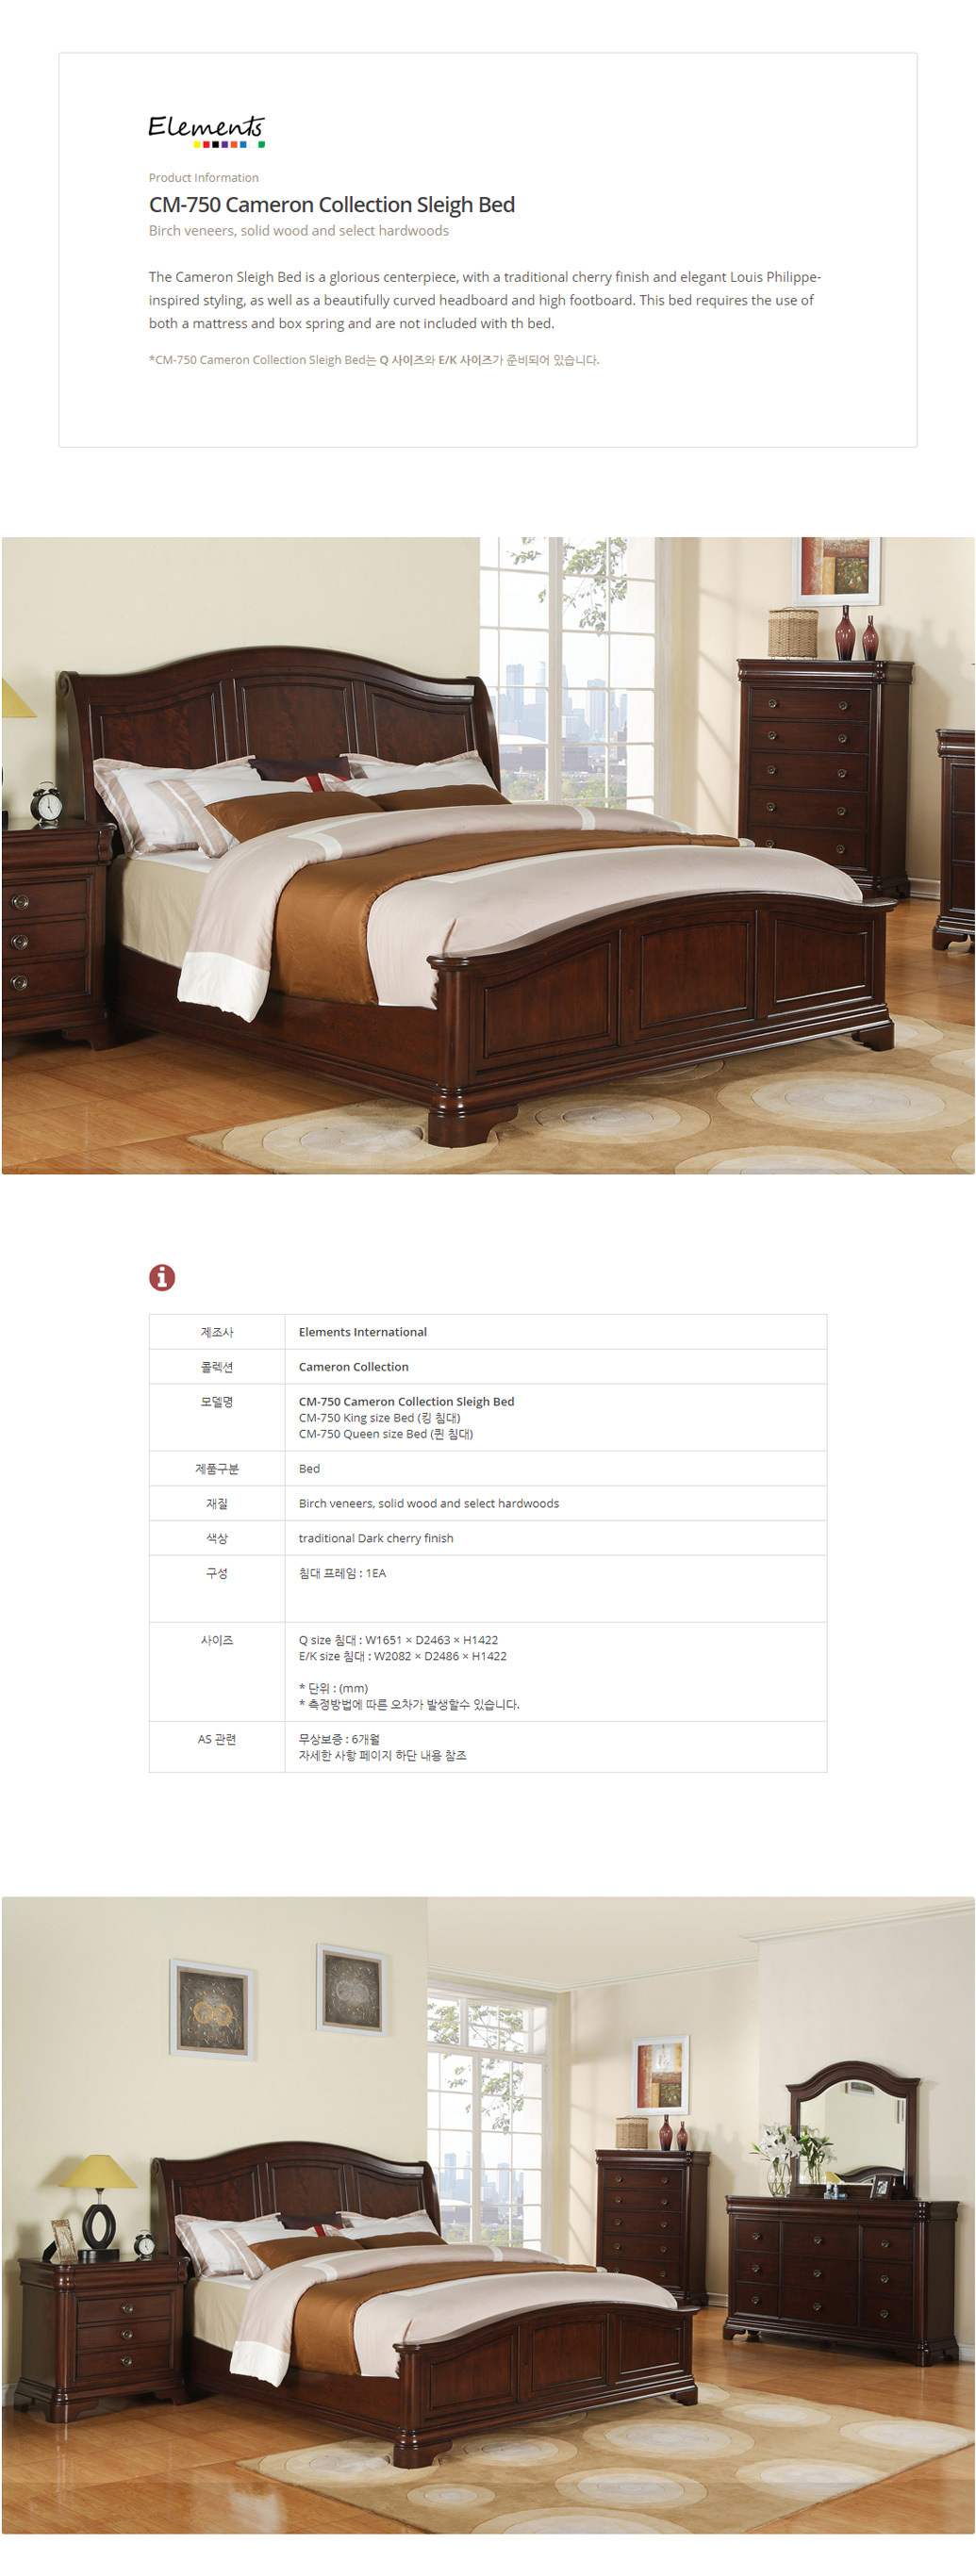 cm_750_cameron_sleigh_bed.jpg